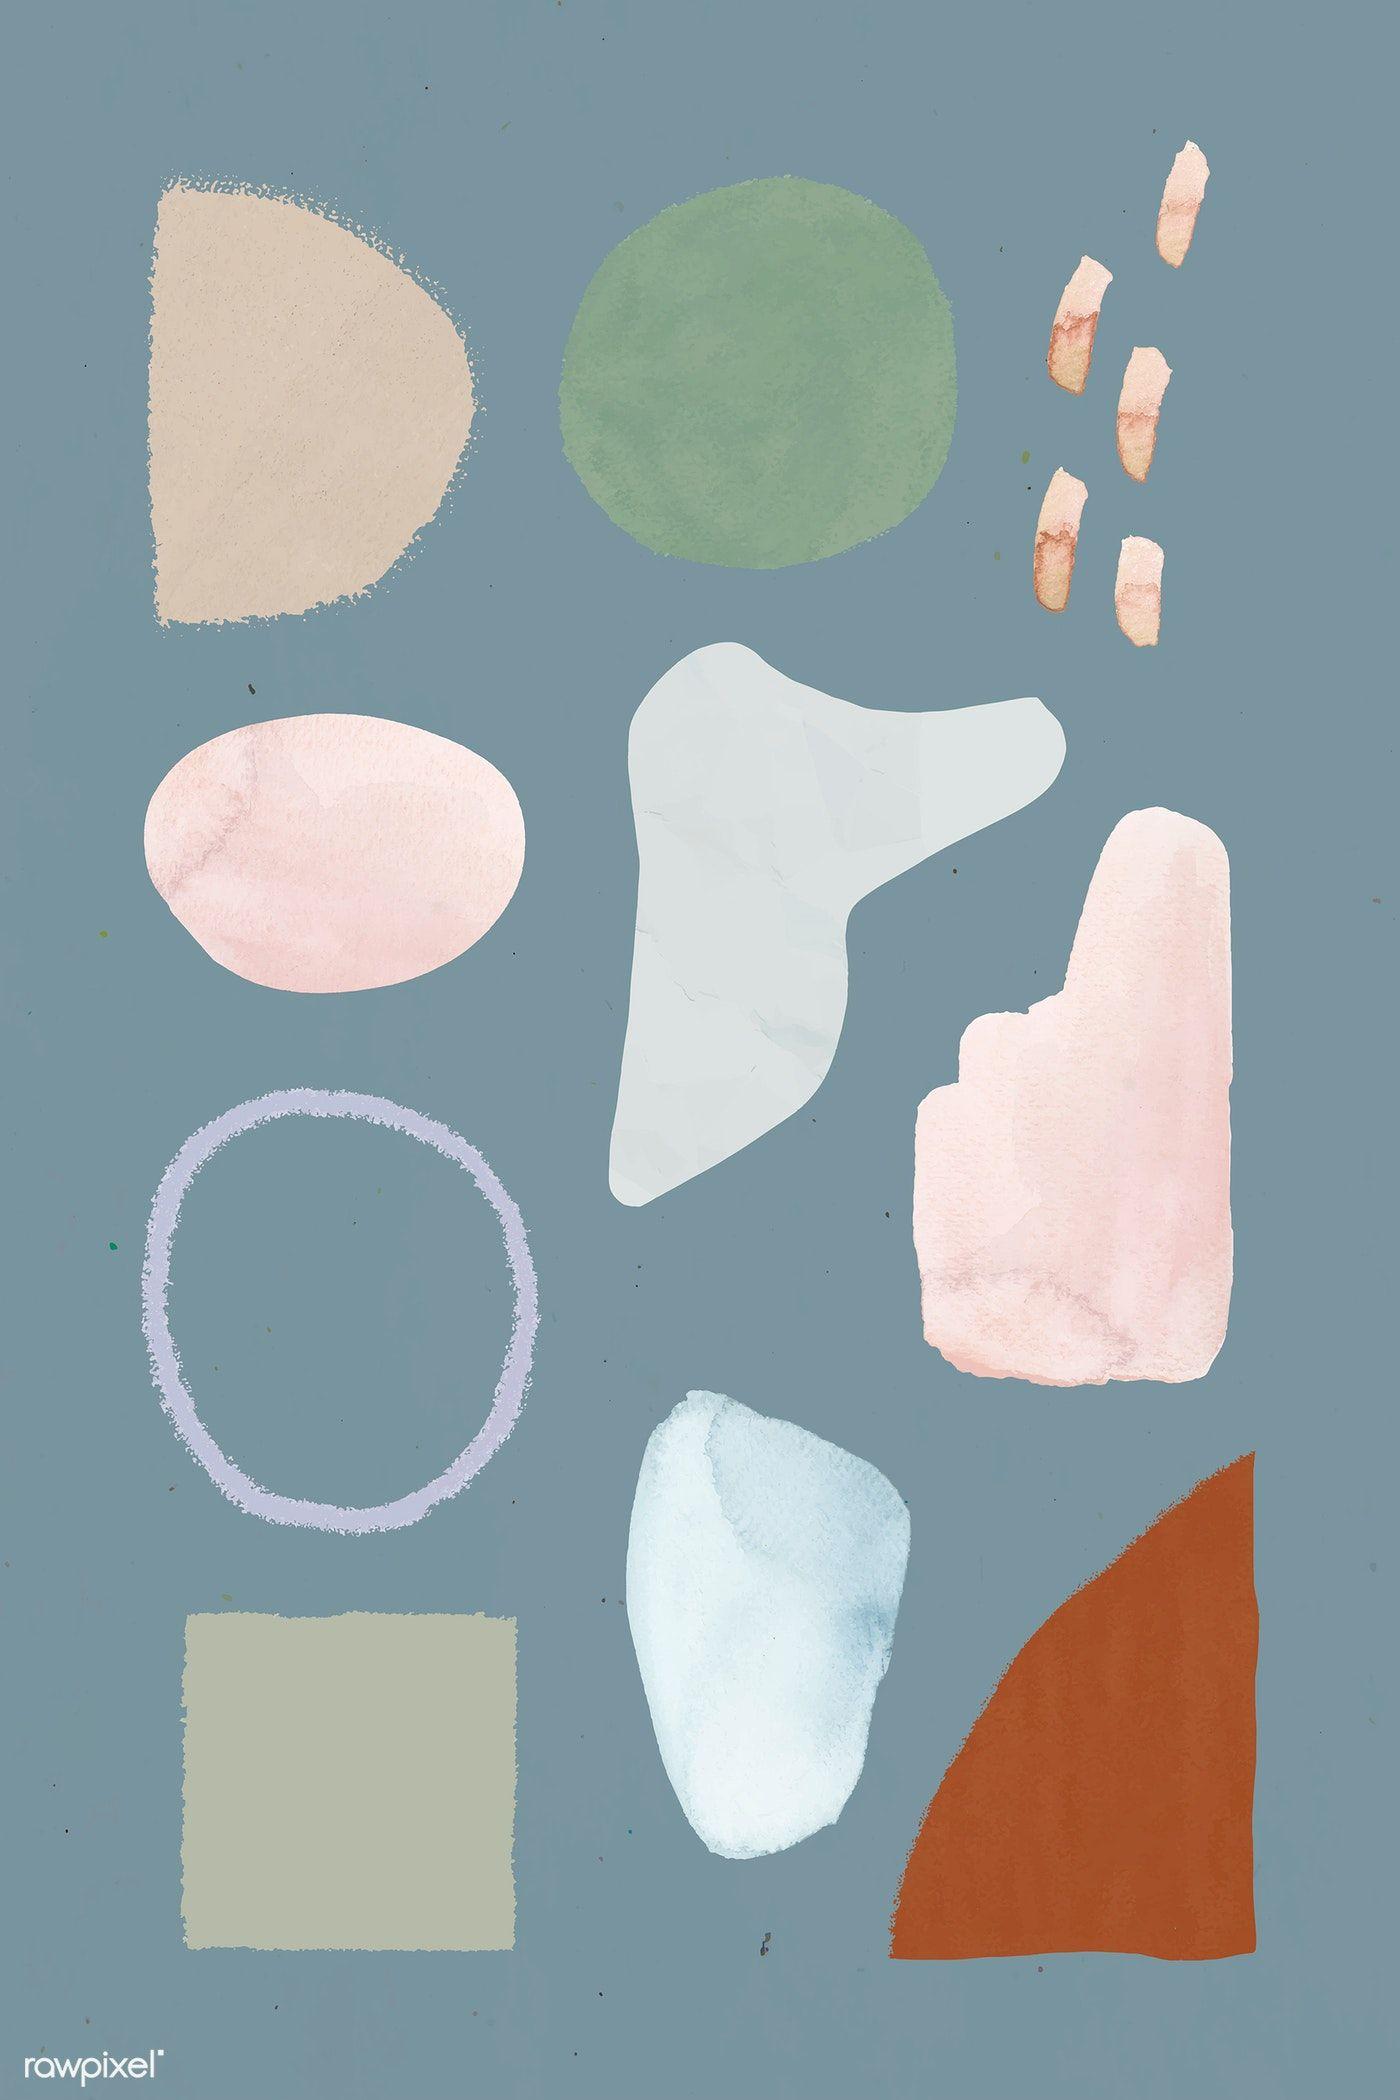 Download premium illustration of Neutral watercolor